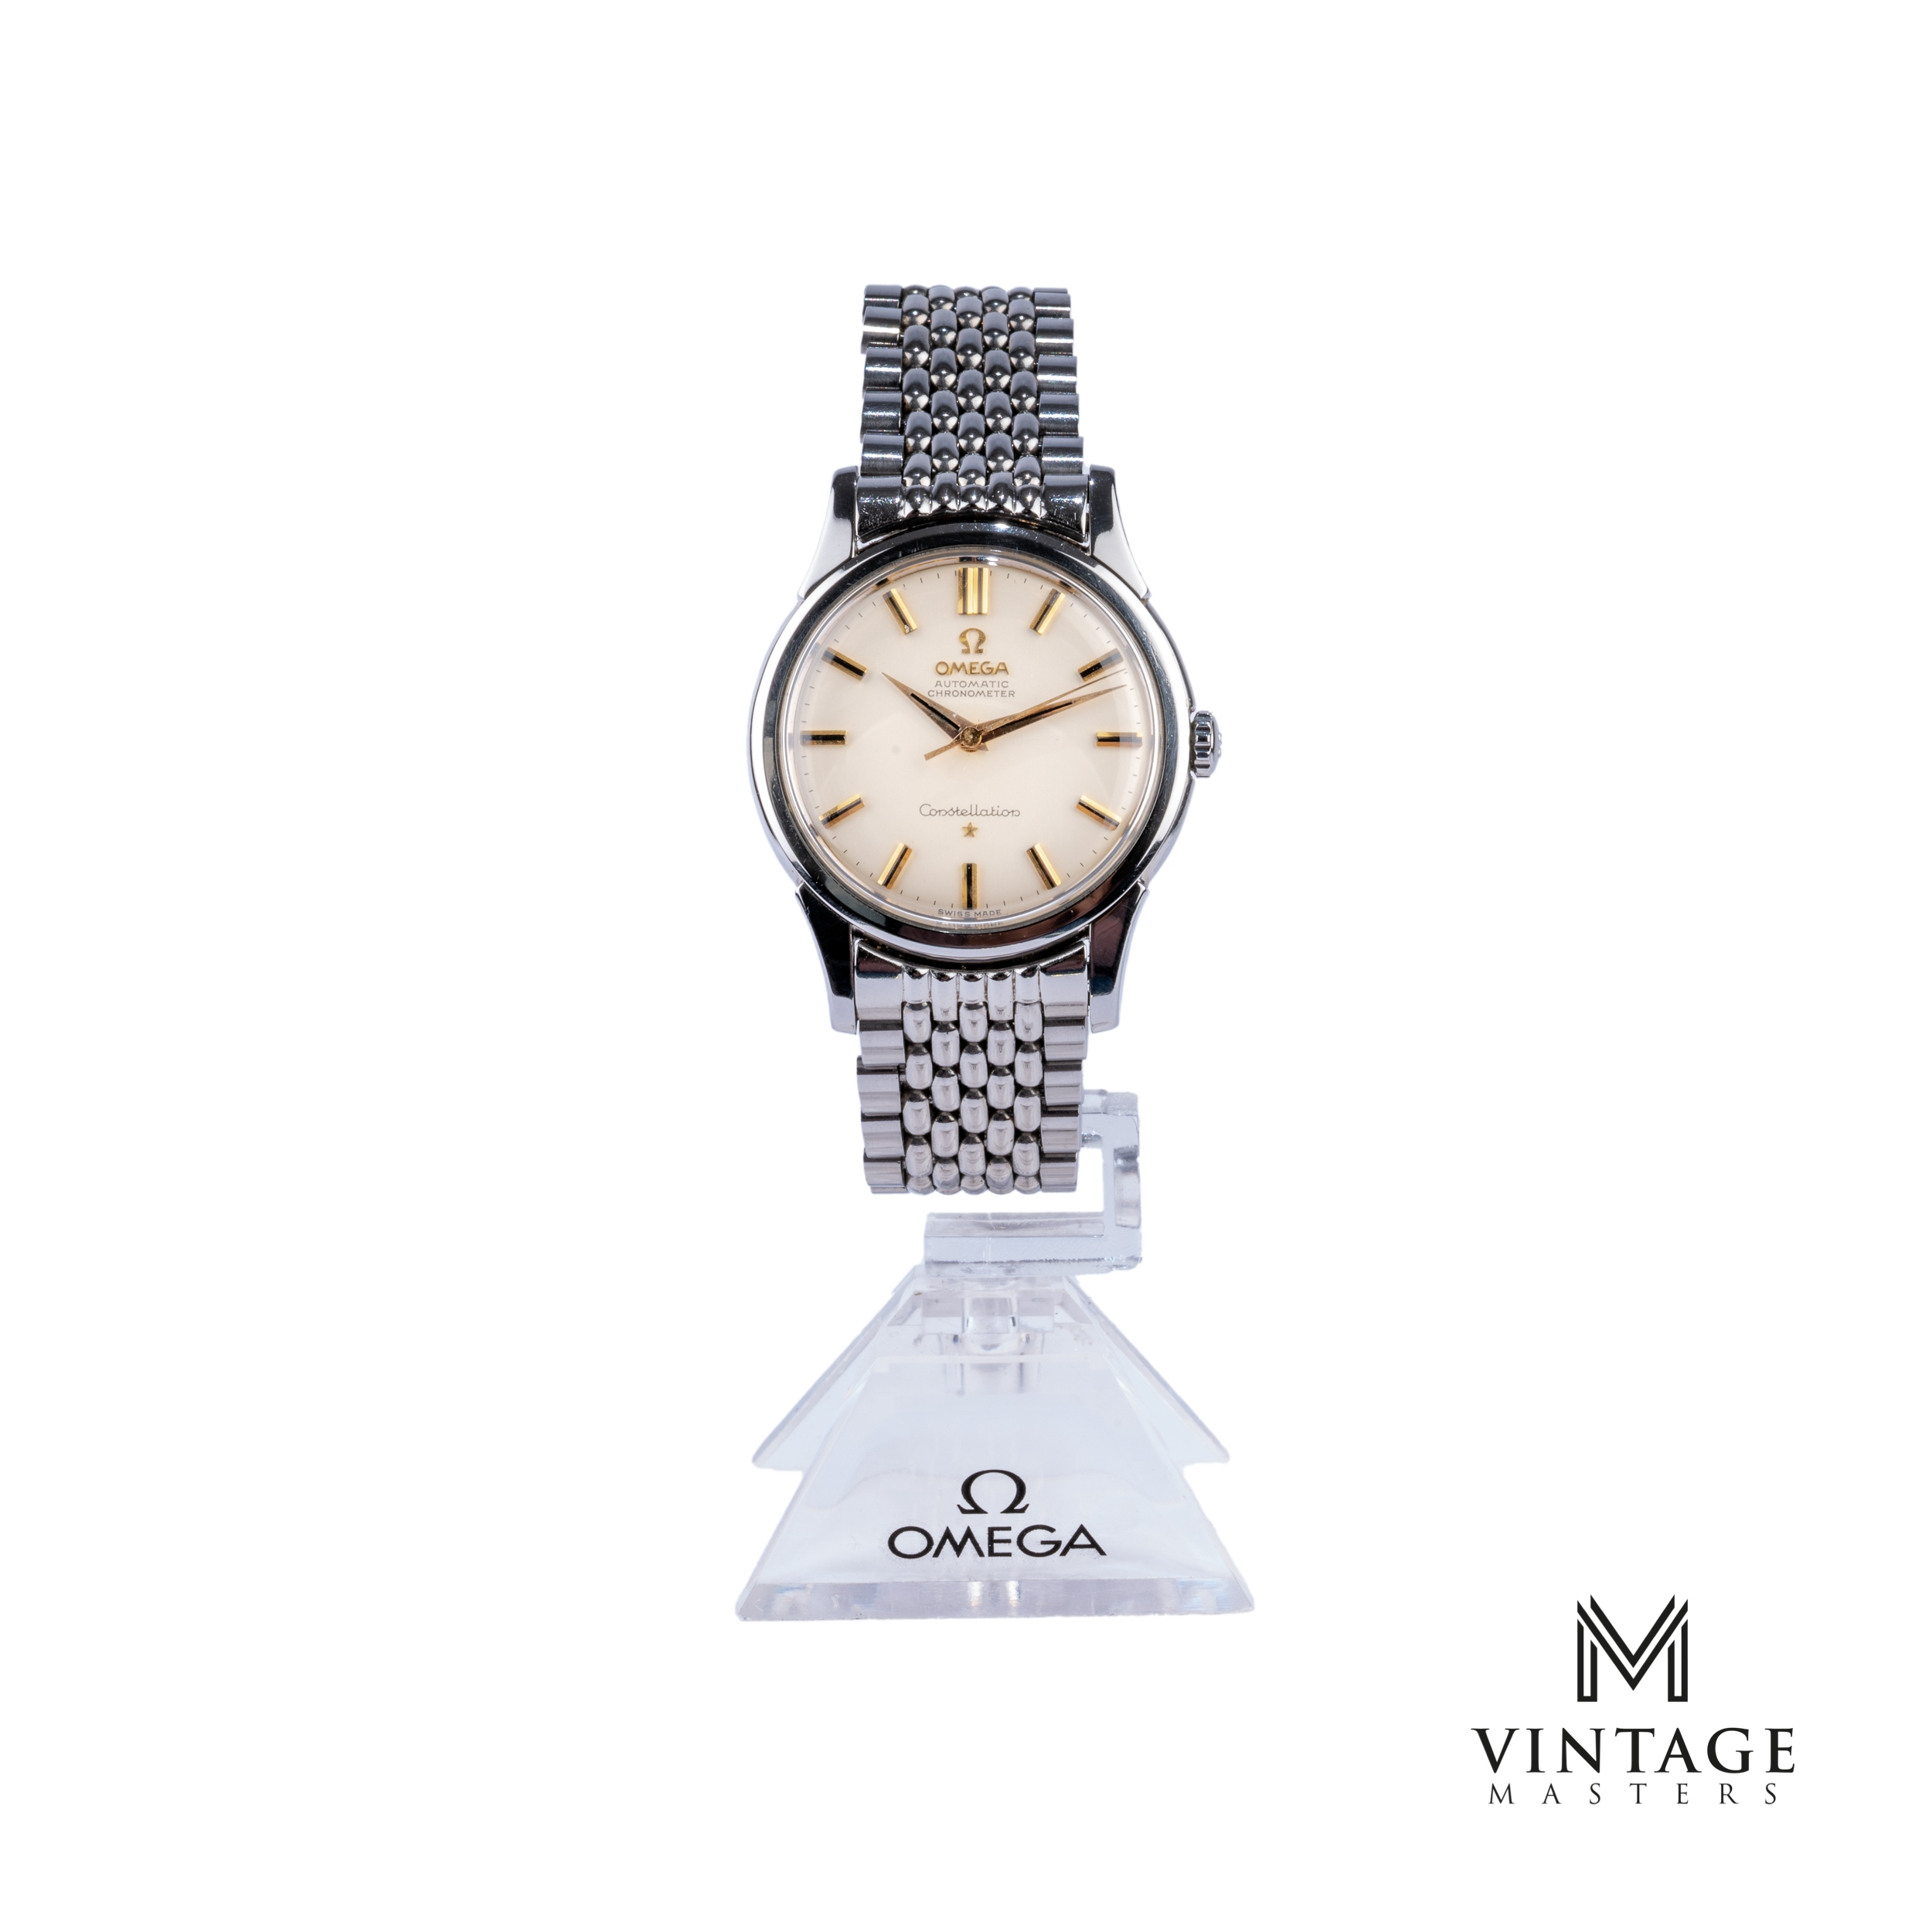 vintage Omega Constellation watch 14381-8 SC front